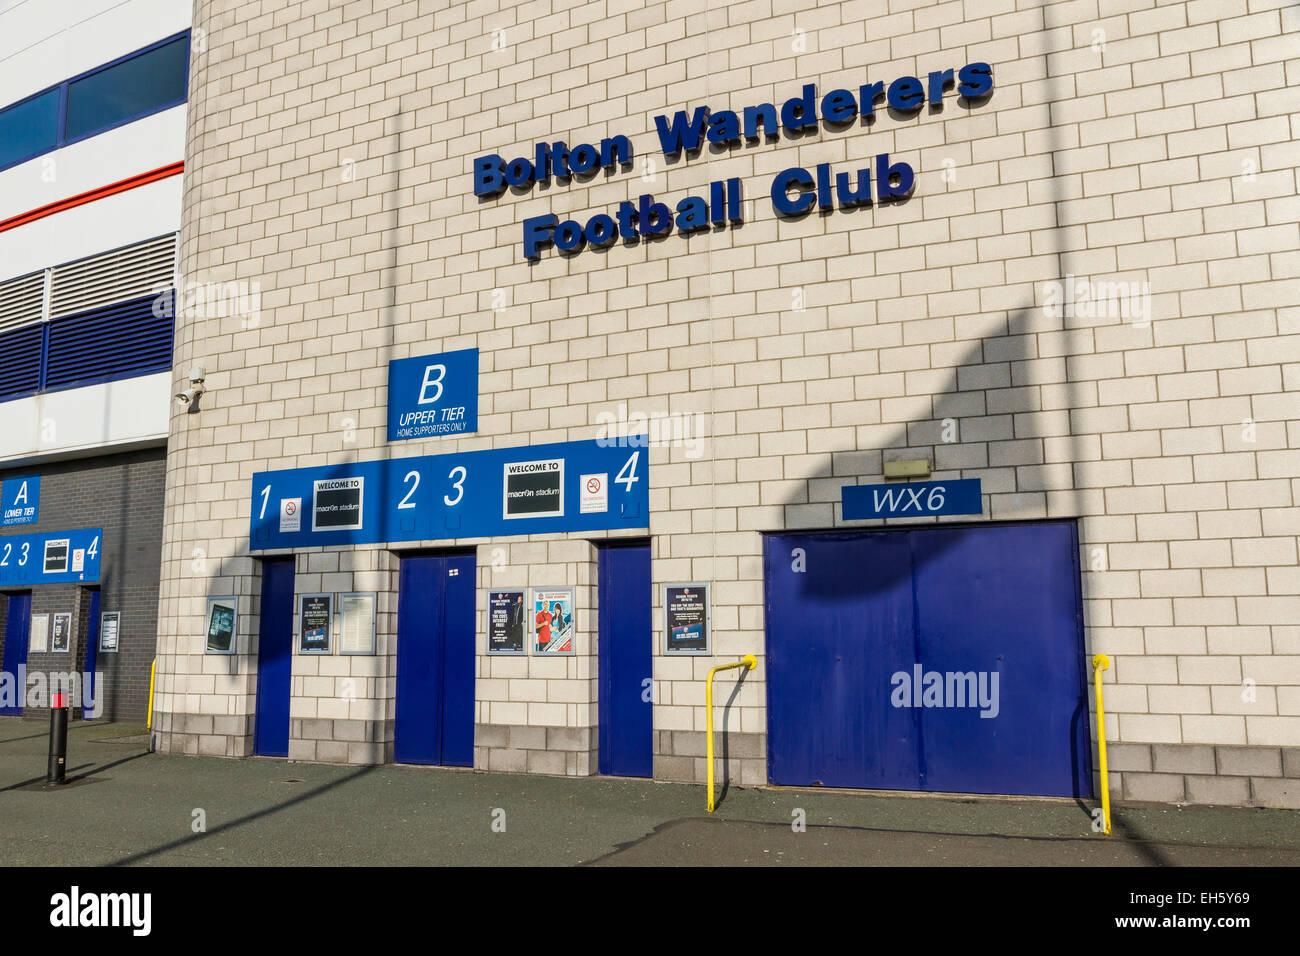 Turnstiles at Bolton Wanderers Reebok Macron Stadium in Horwich, Bolton. - Stock Image